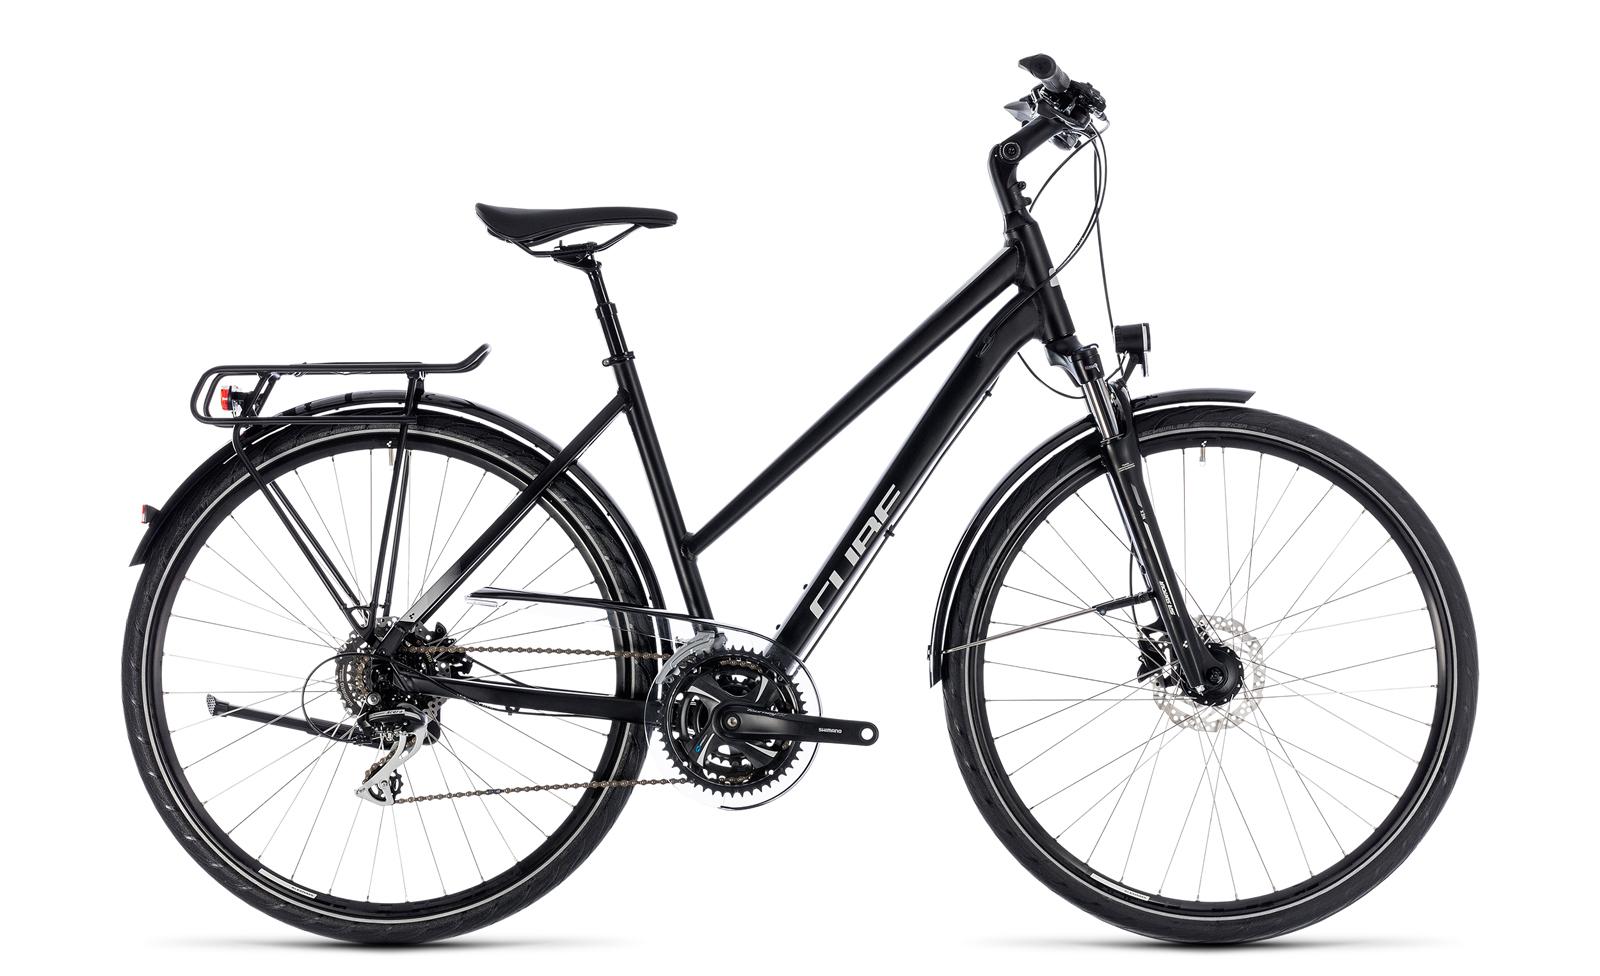 cube touring one damen trekking fahrrad schwarz grau 2018. Black Bedroom Furniture Sets. Home Design Ideas